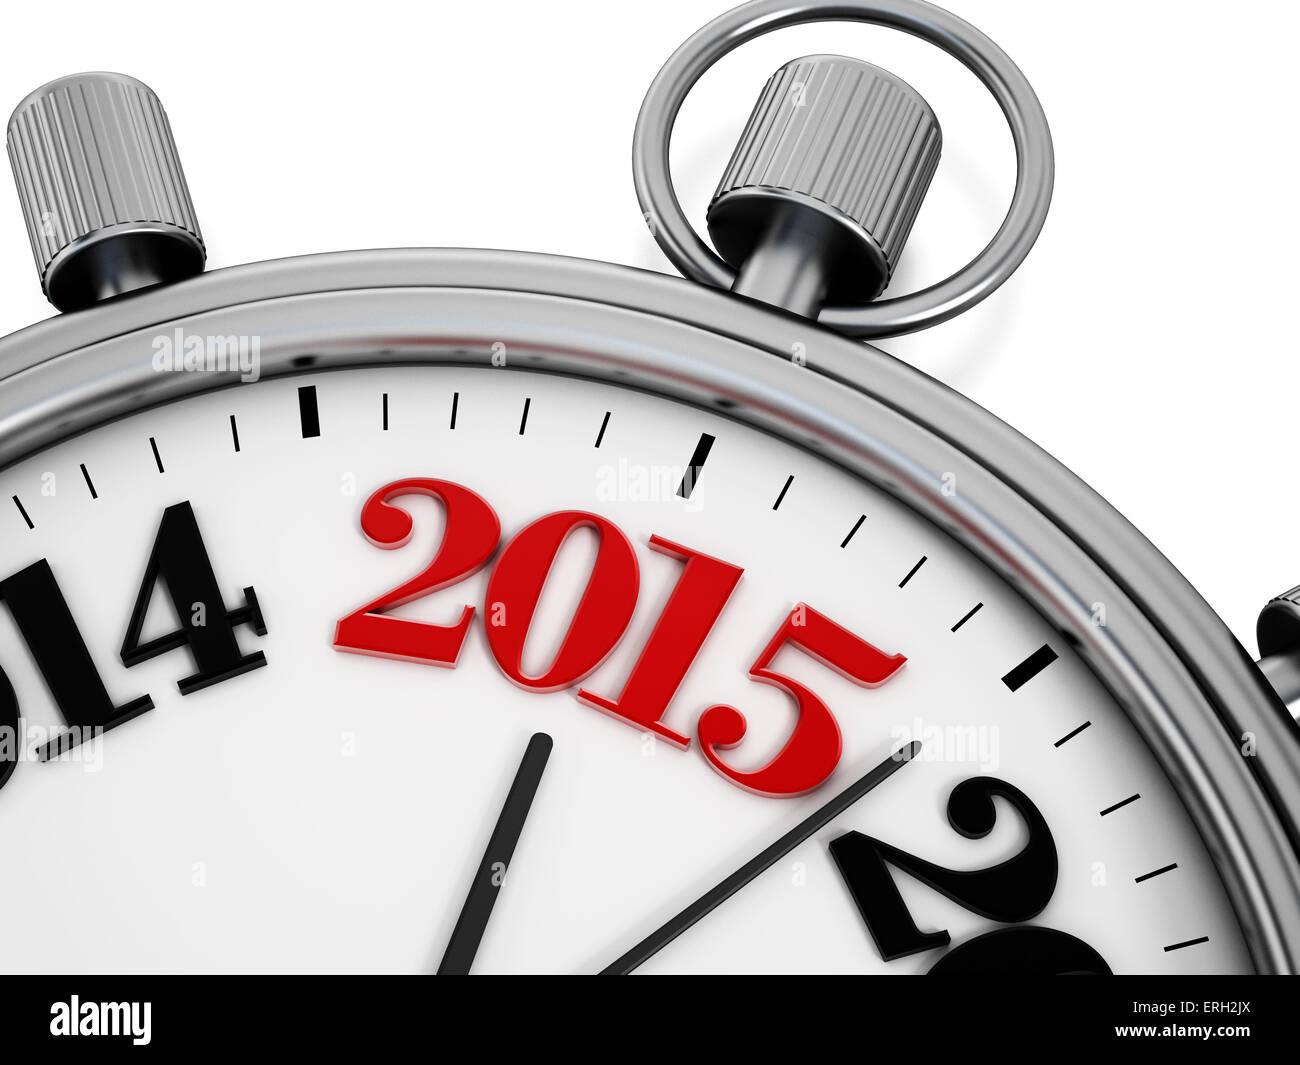 2015 text on chronometer - Stock Image